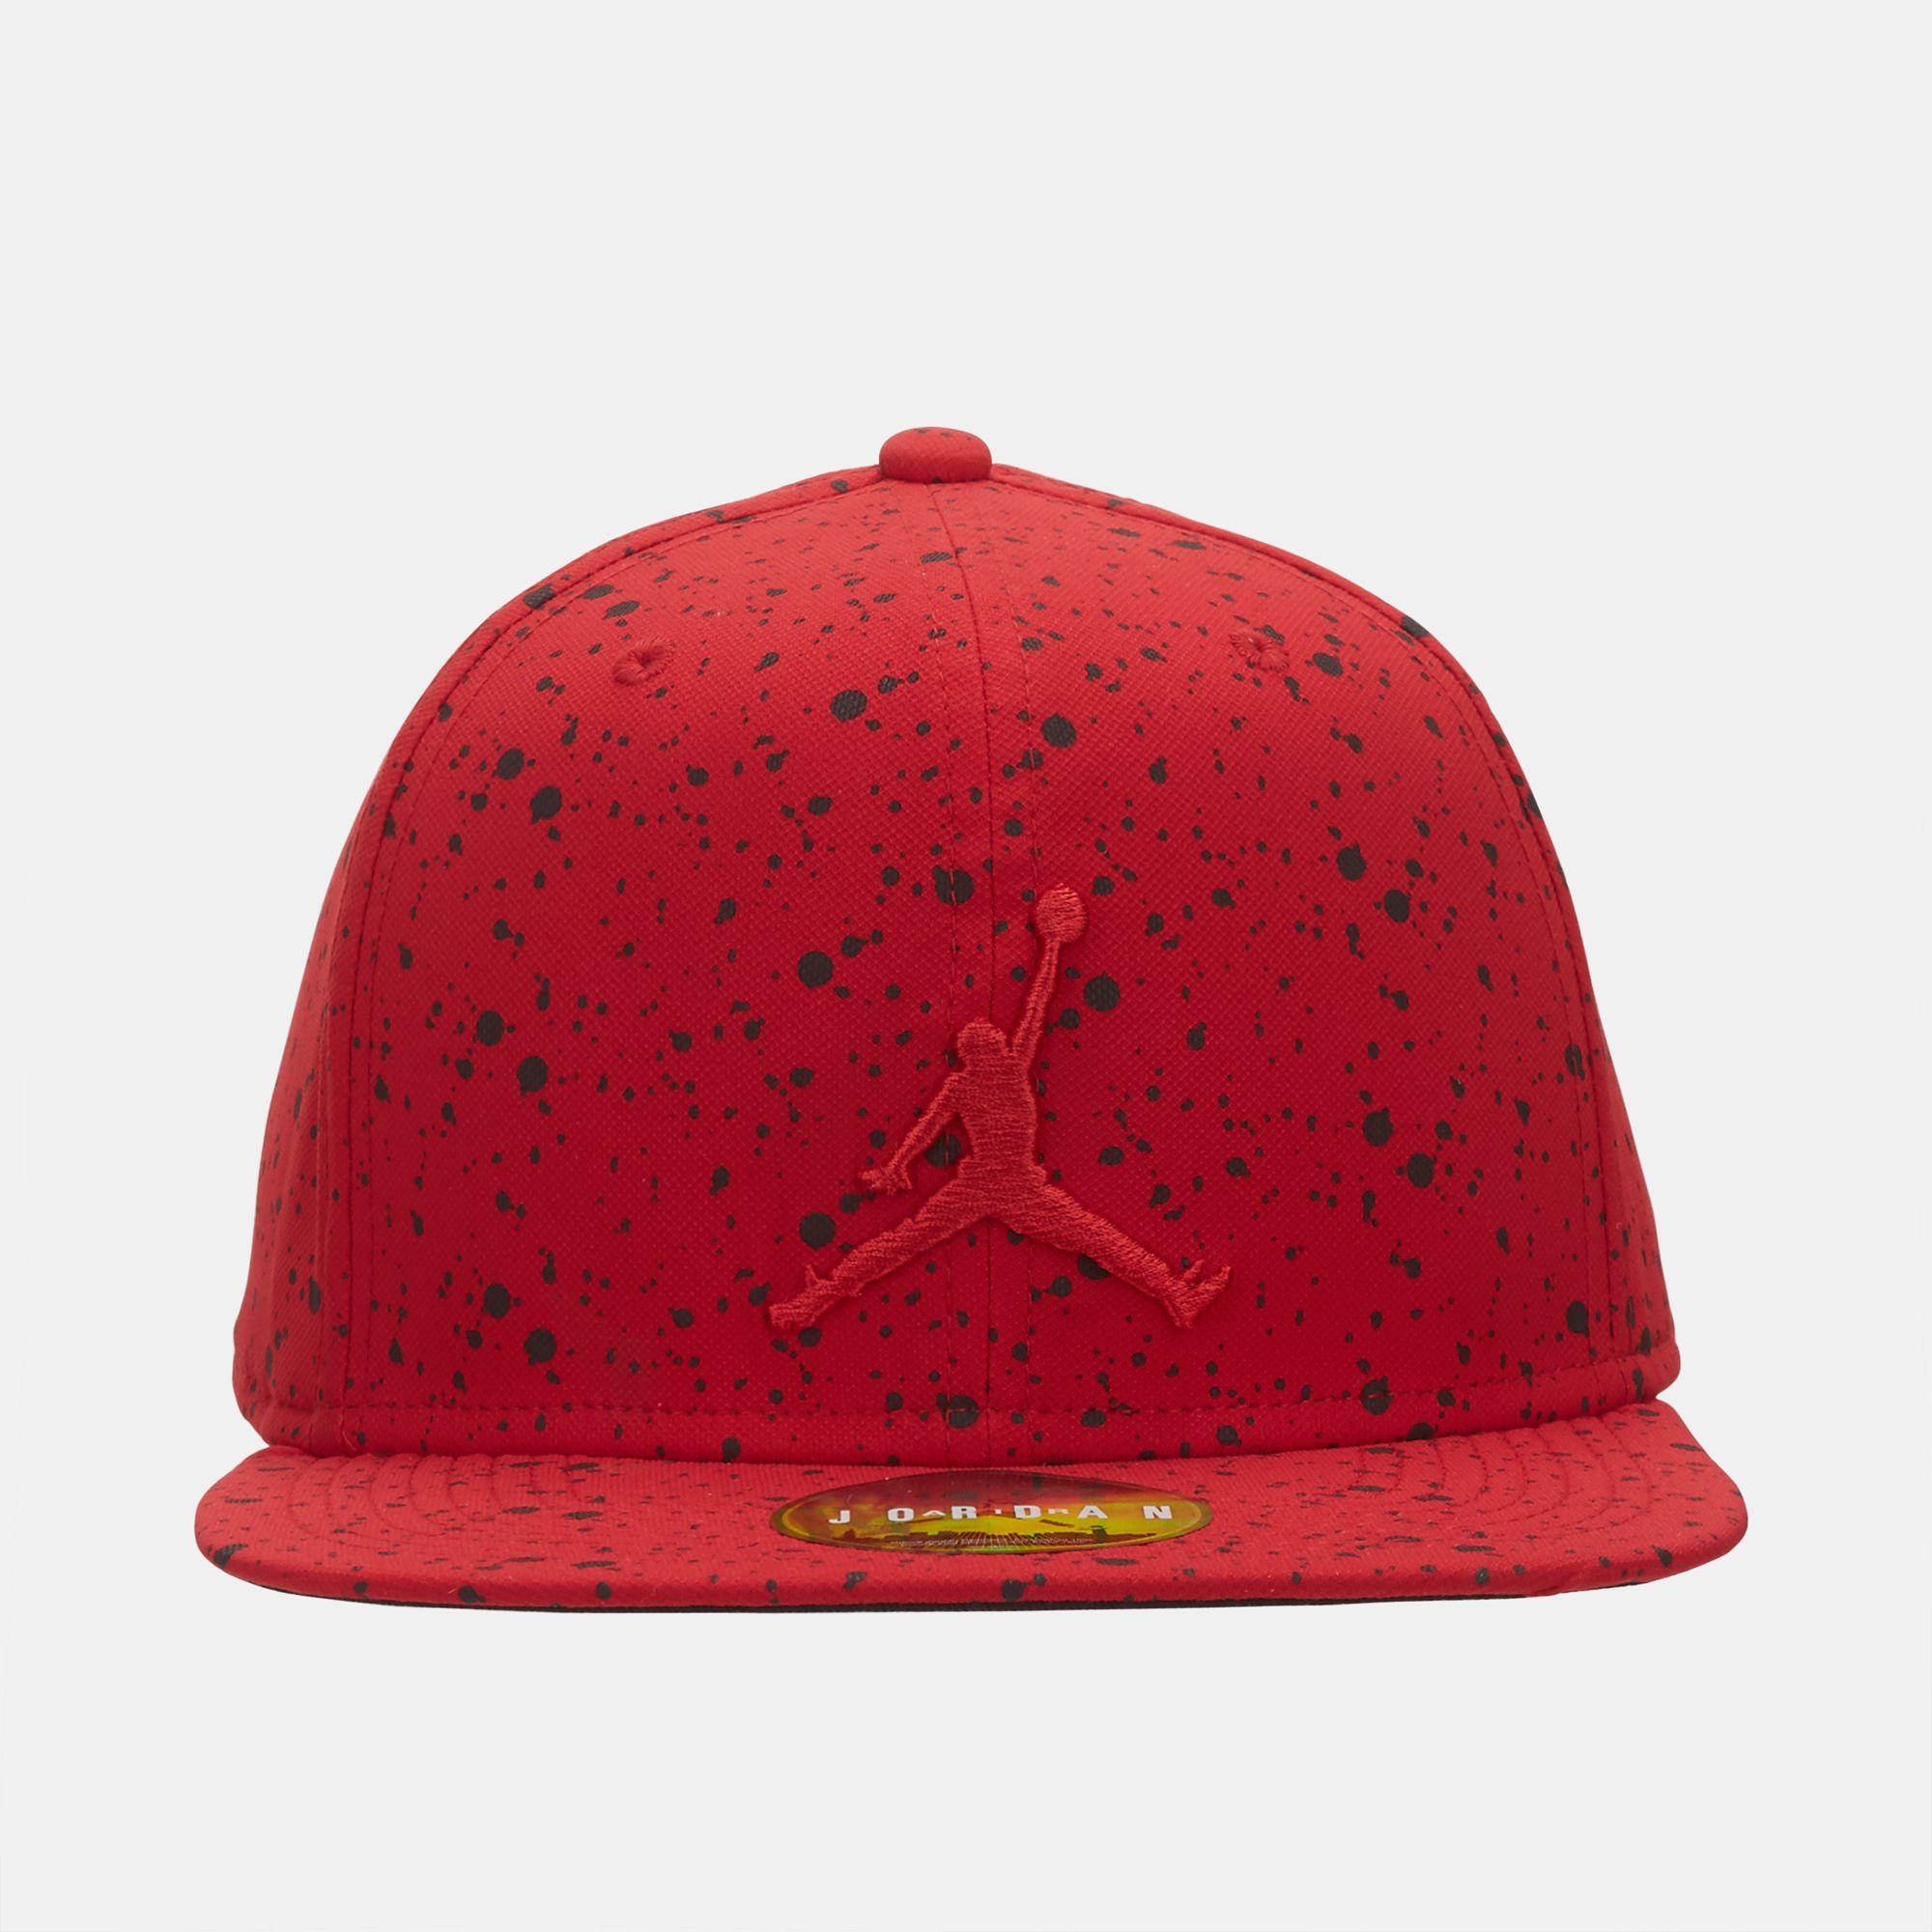 229575b424a1b Jordan Speckle Print Snapback Cap